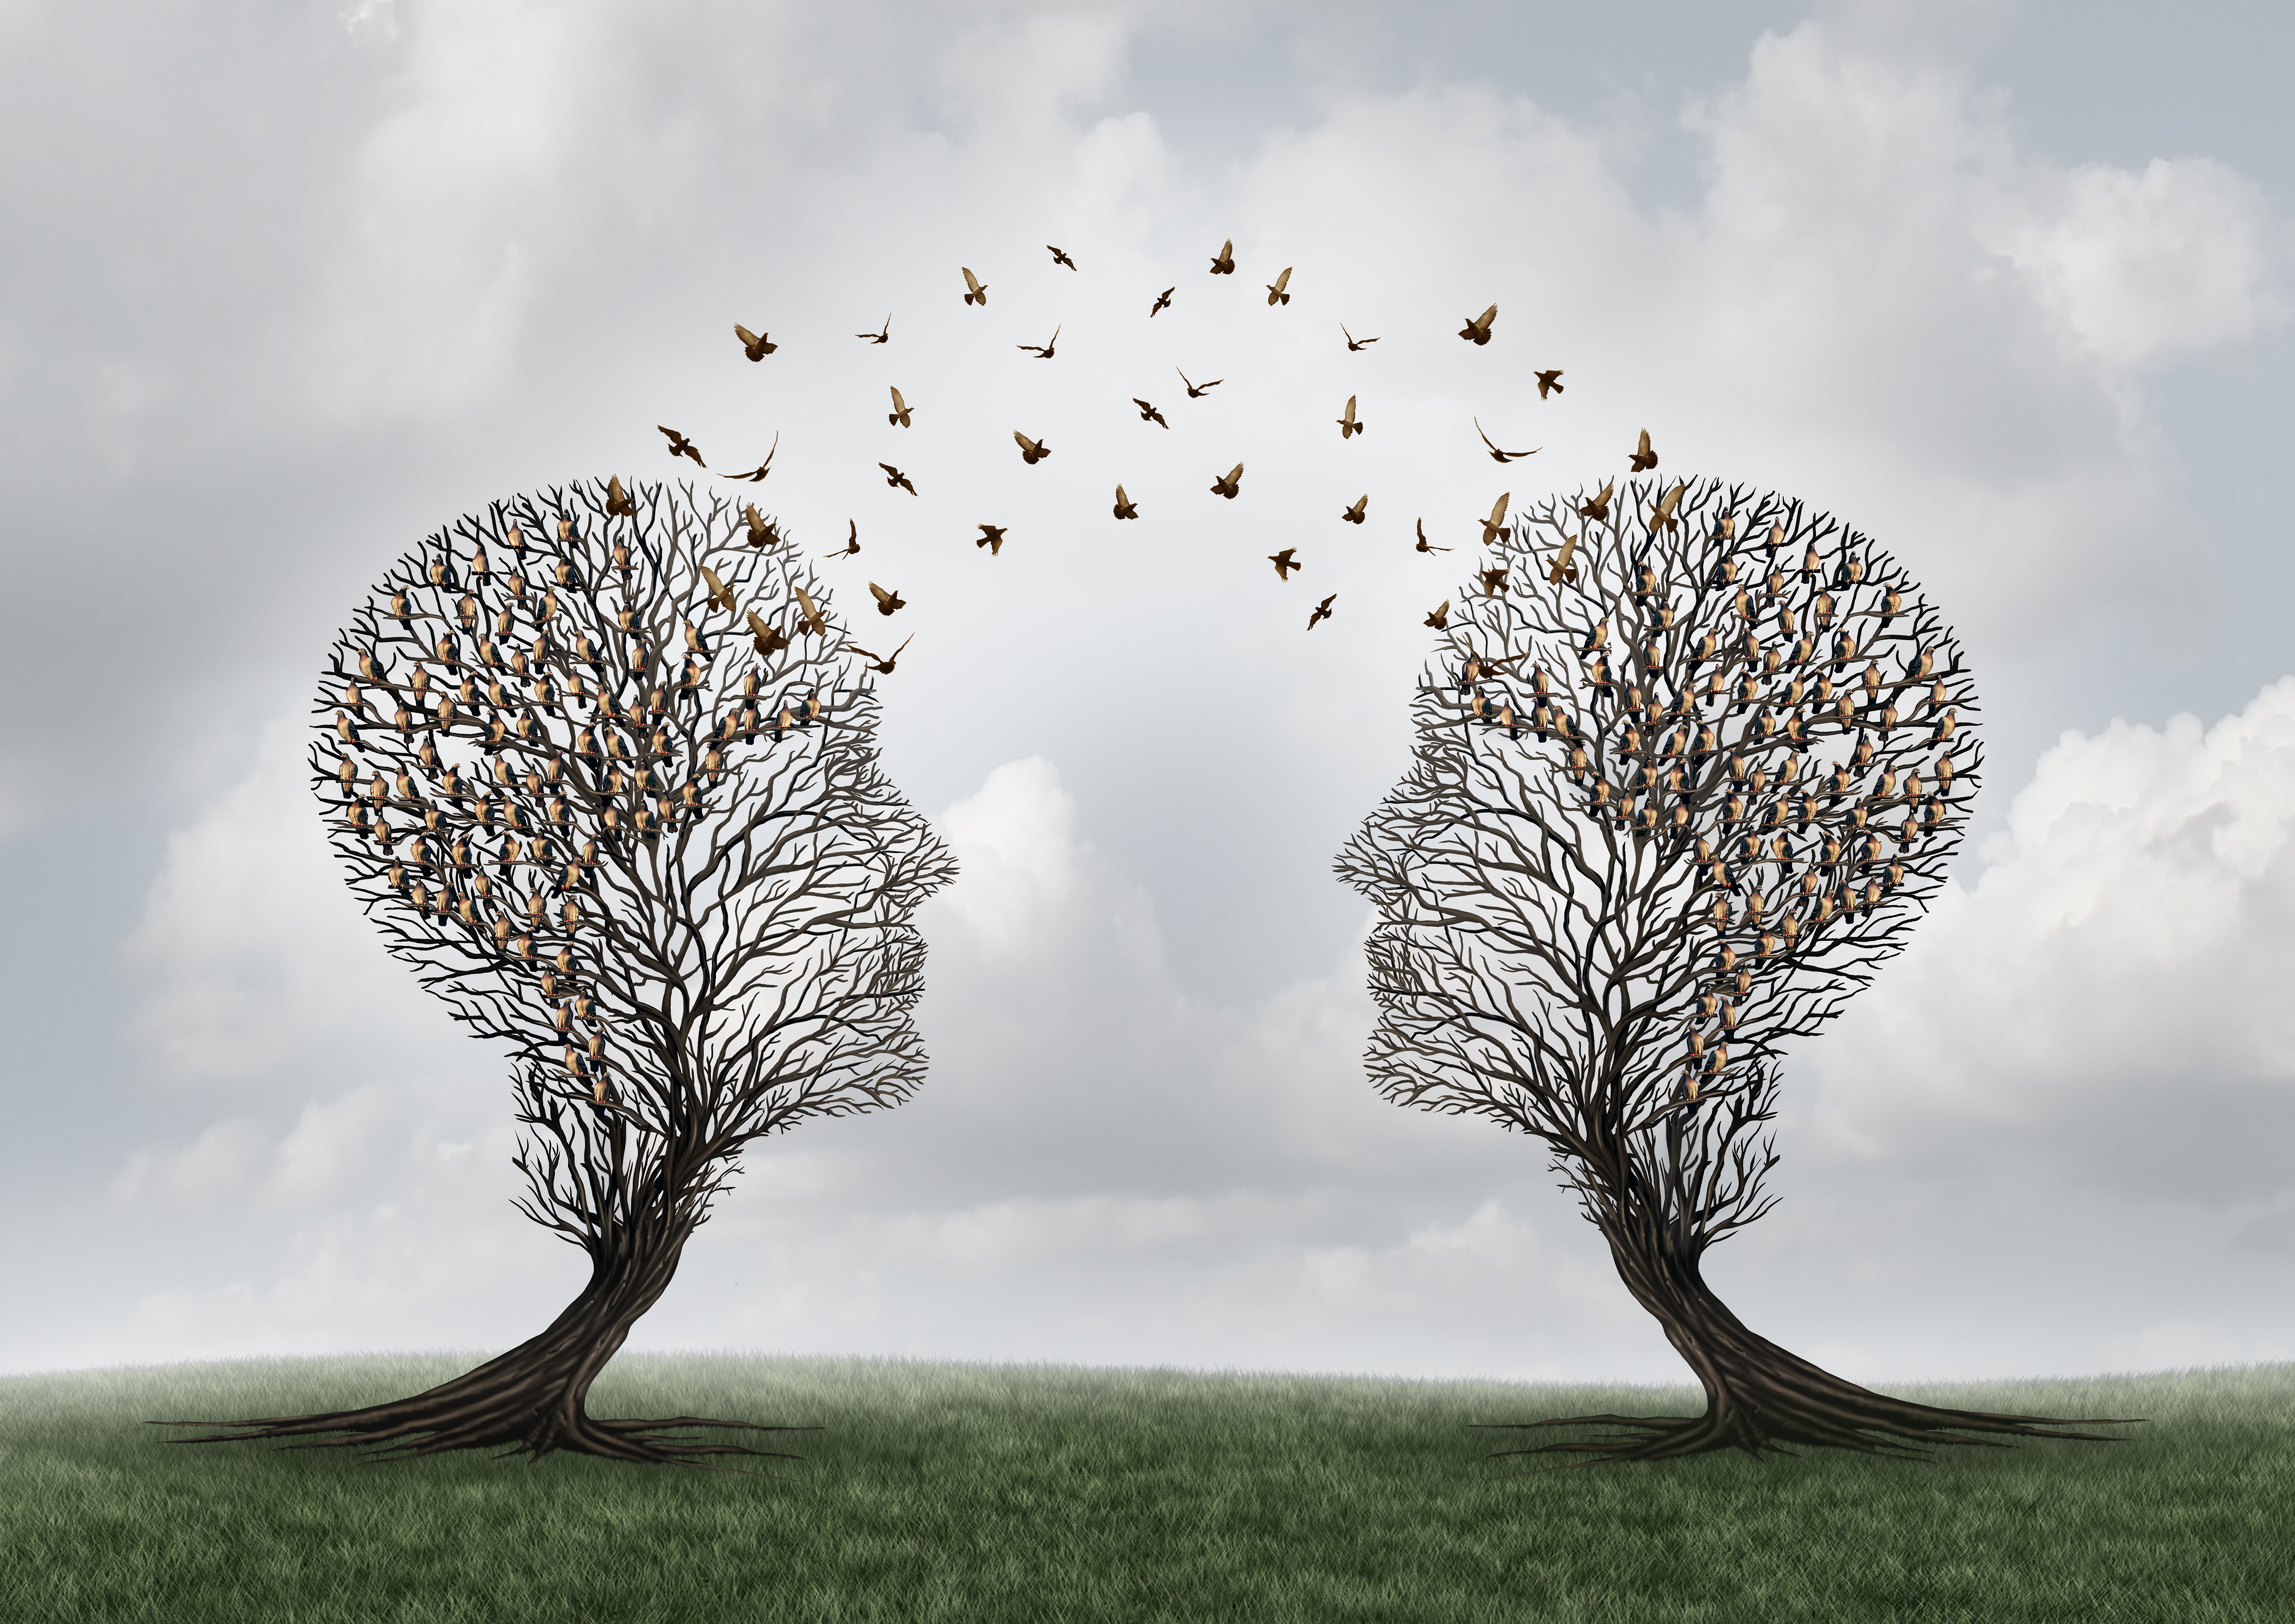 relationships | Psychologies